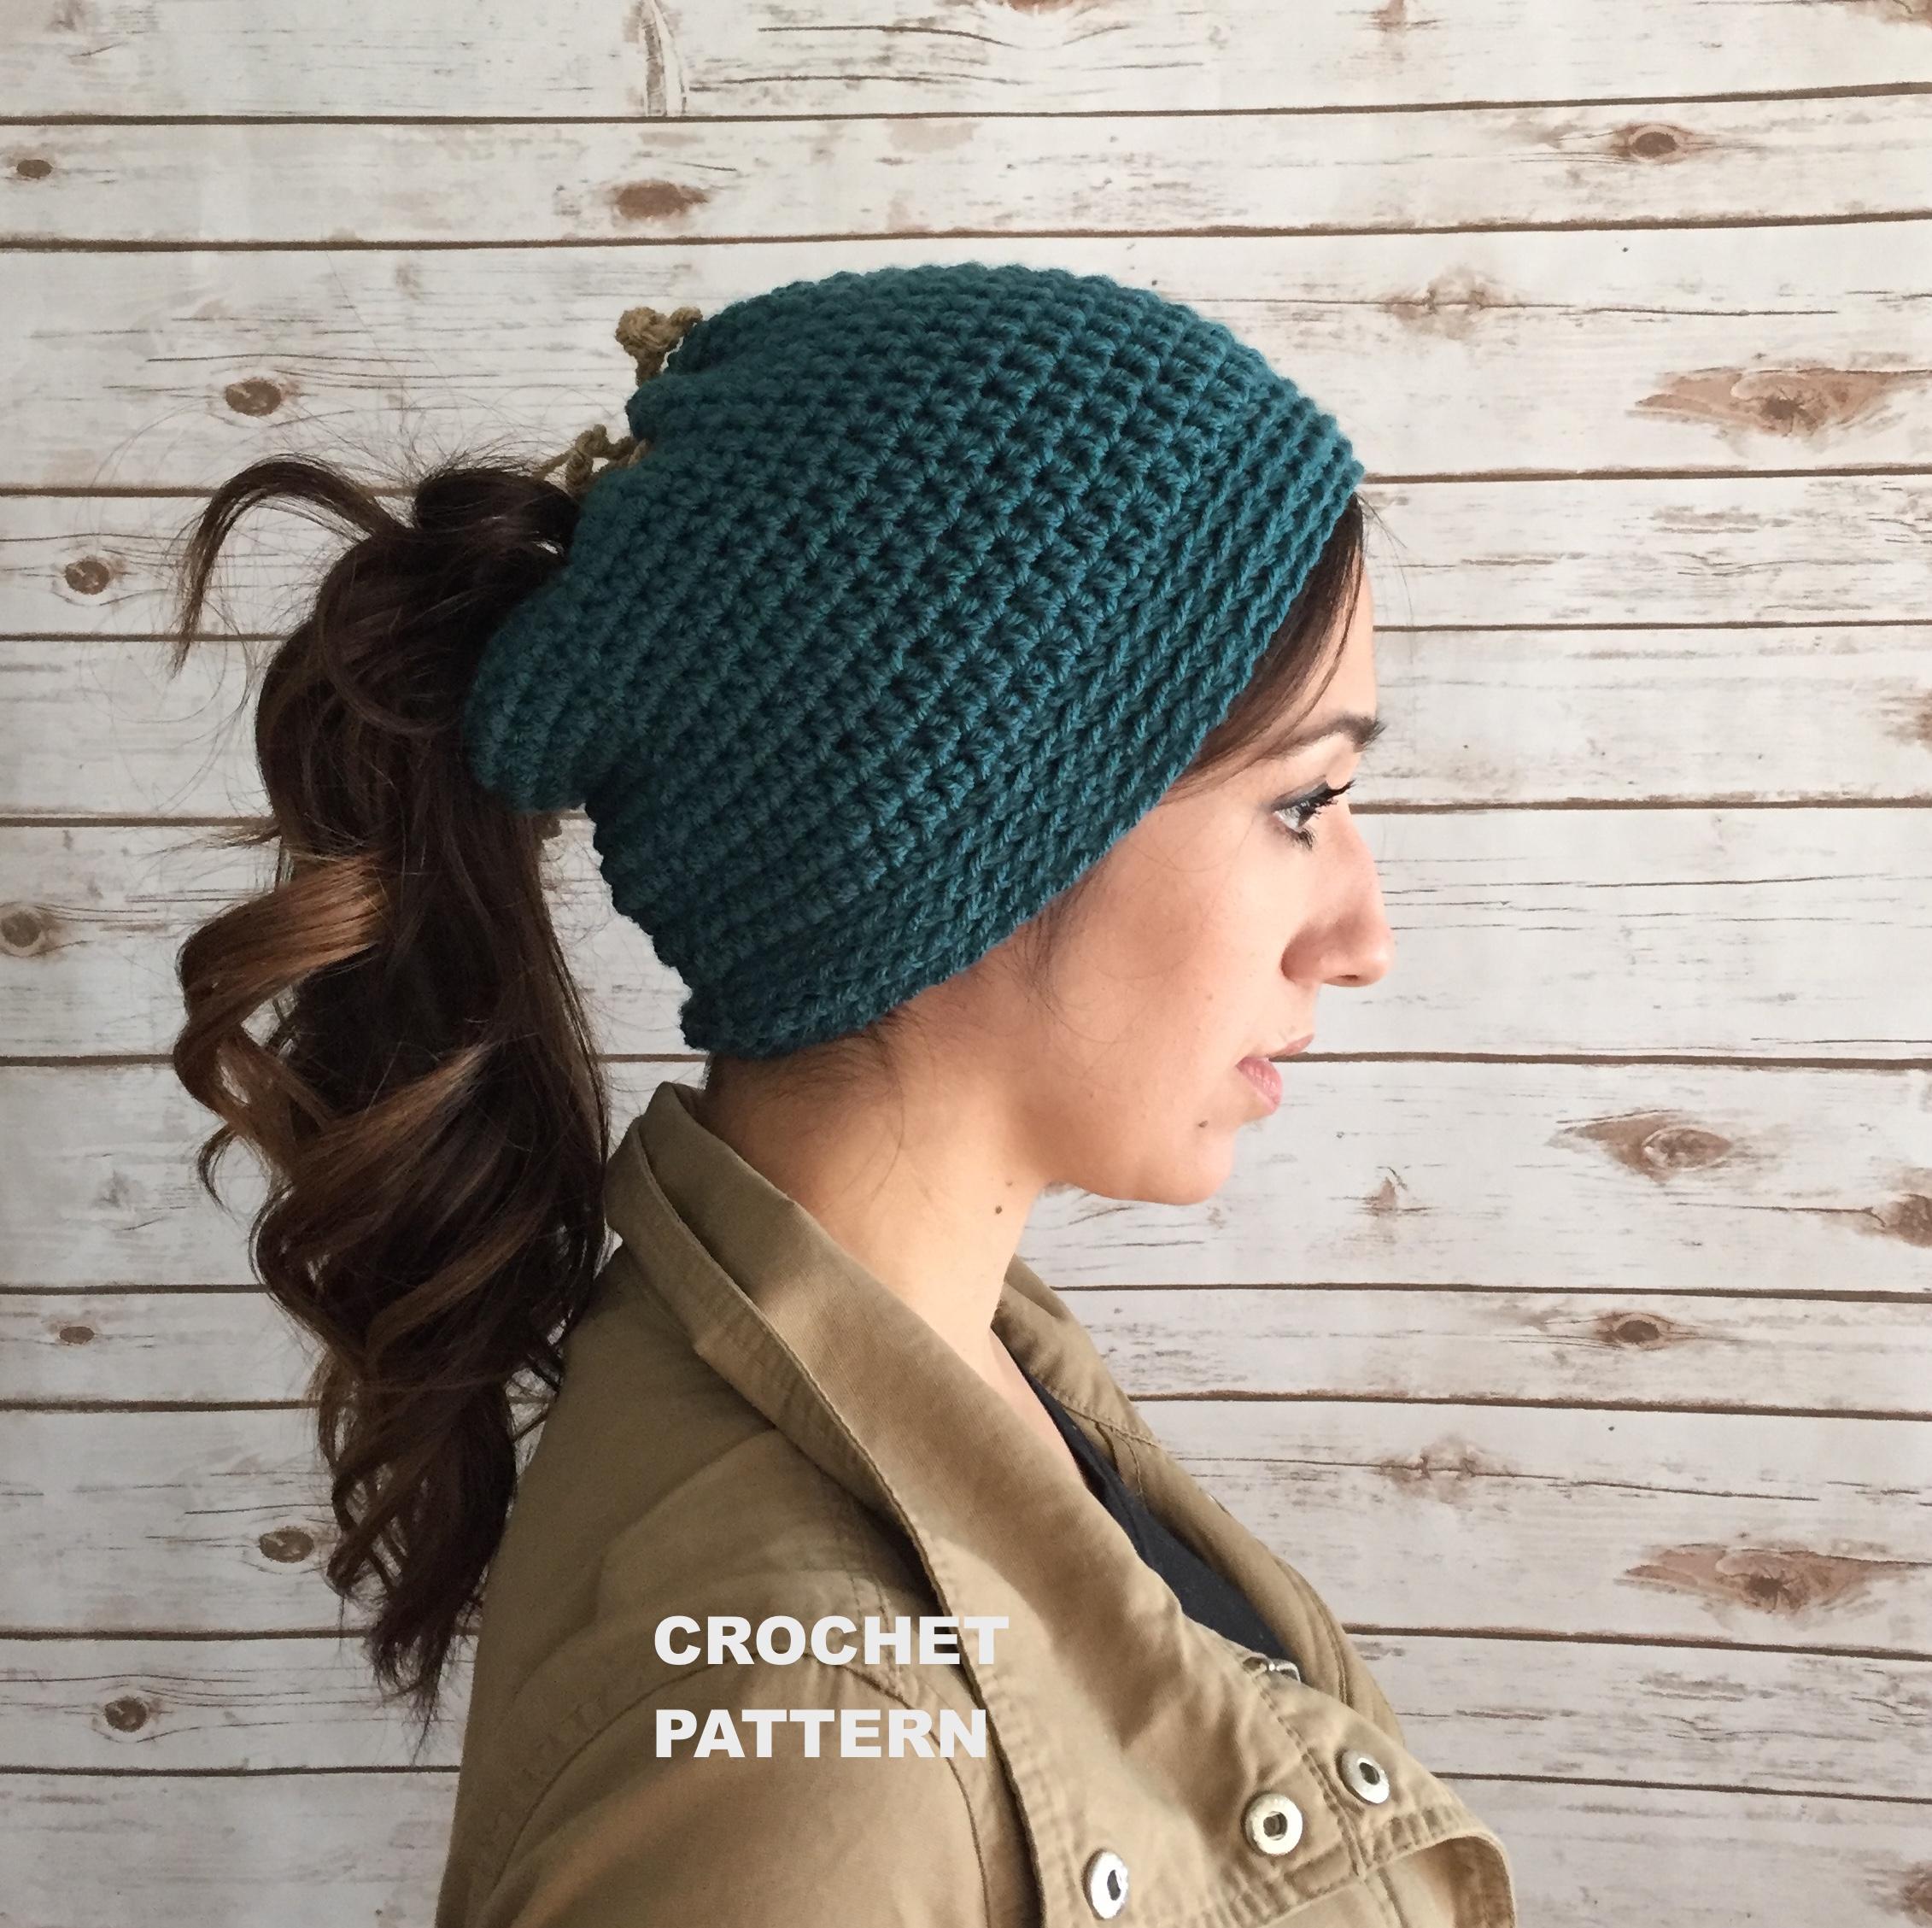 All Patterns 144 Stitches